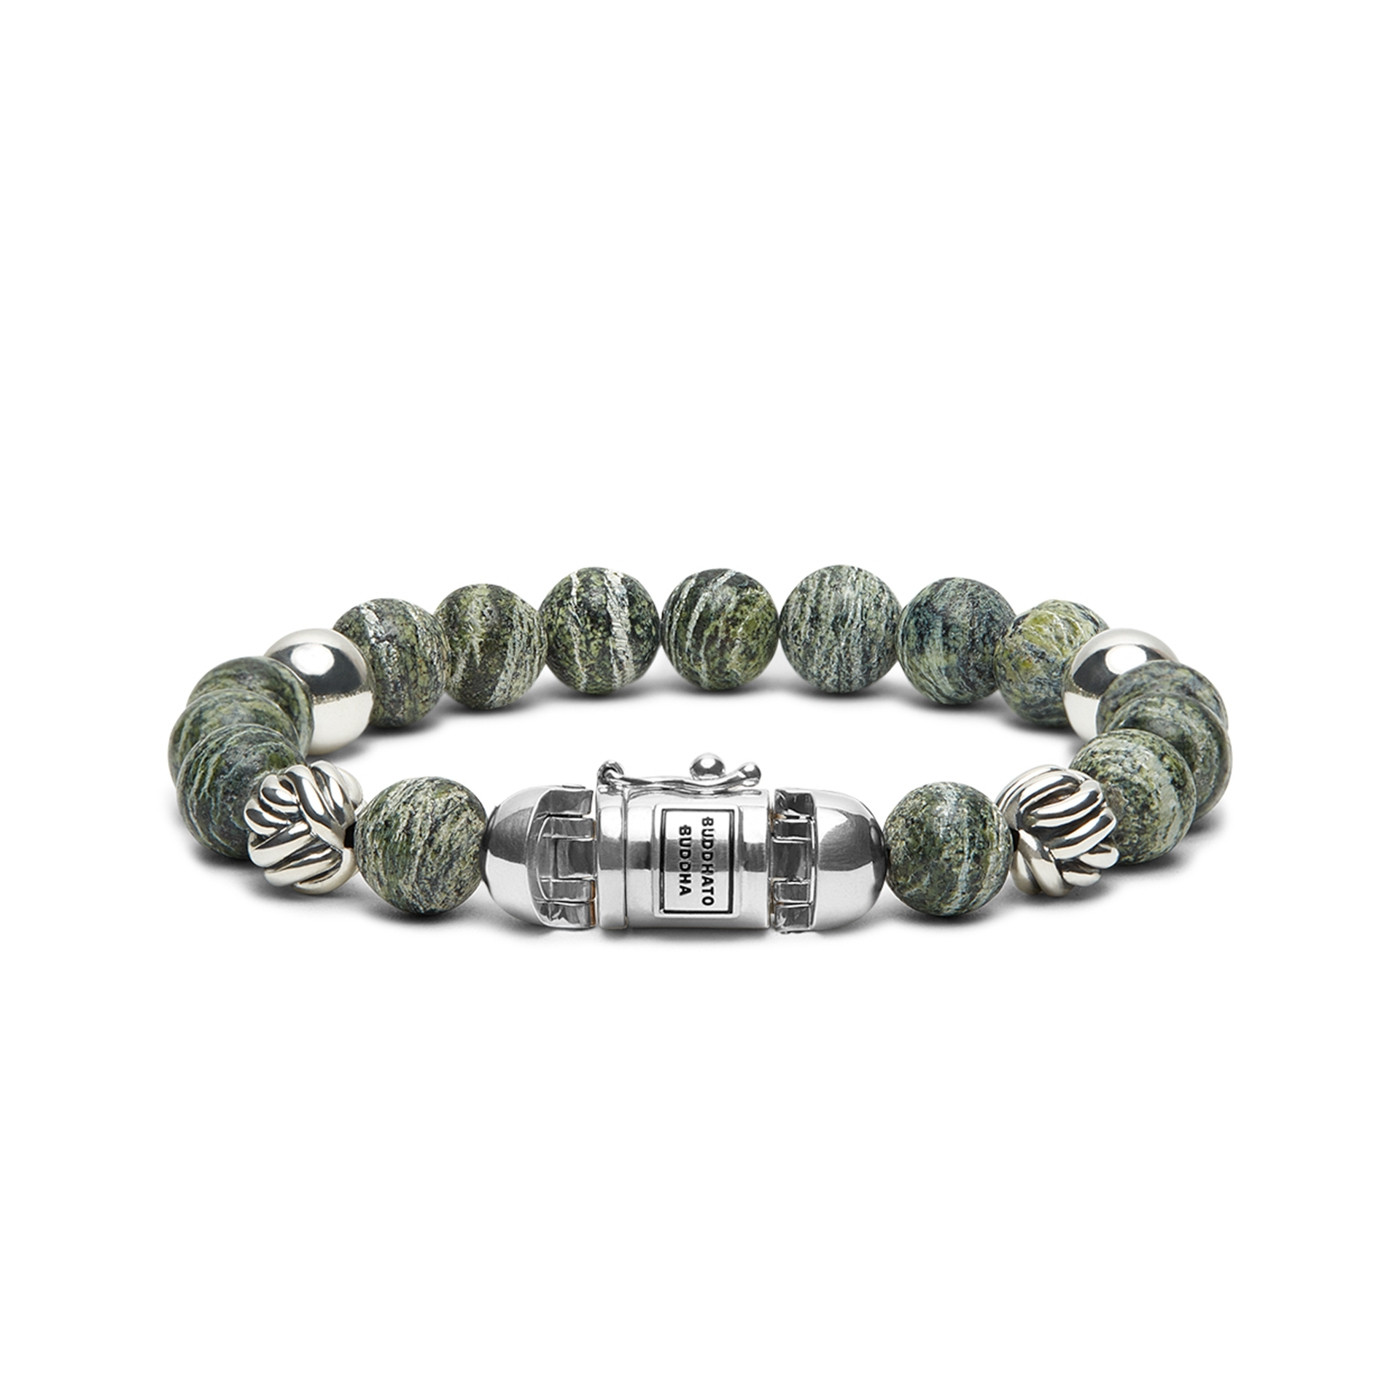 Buddha to Buddha Spirt Bead Green Zebra Armband 188GR (Lengte: 19.00-23.00 cm)